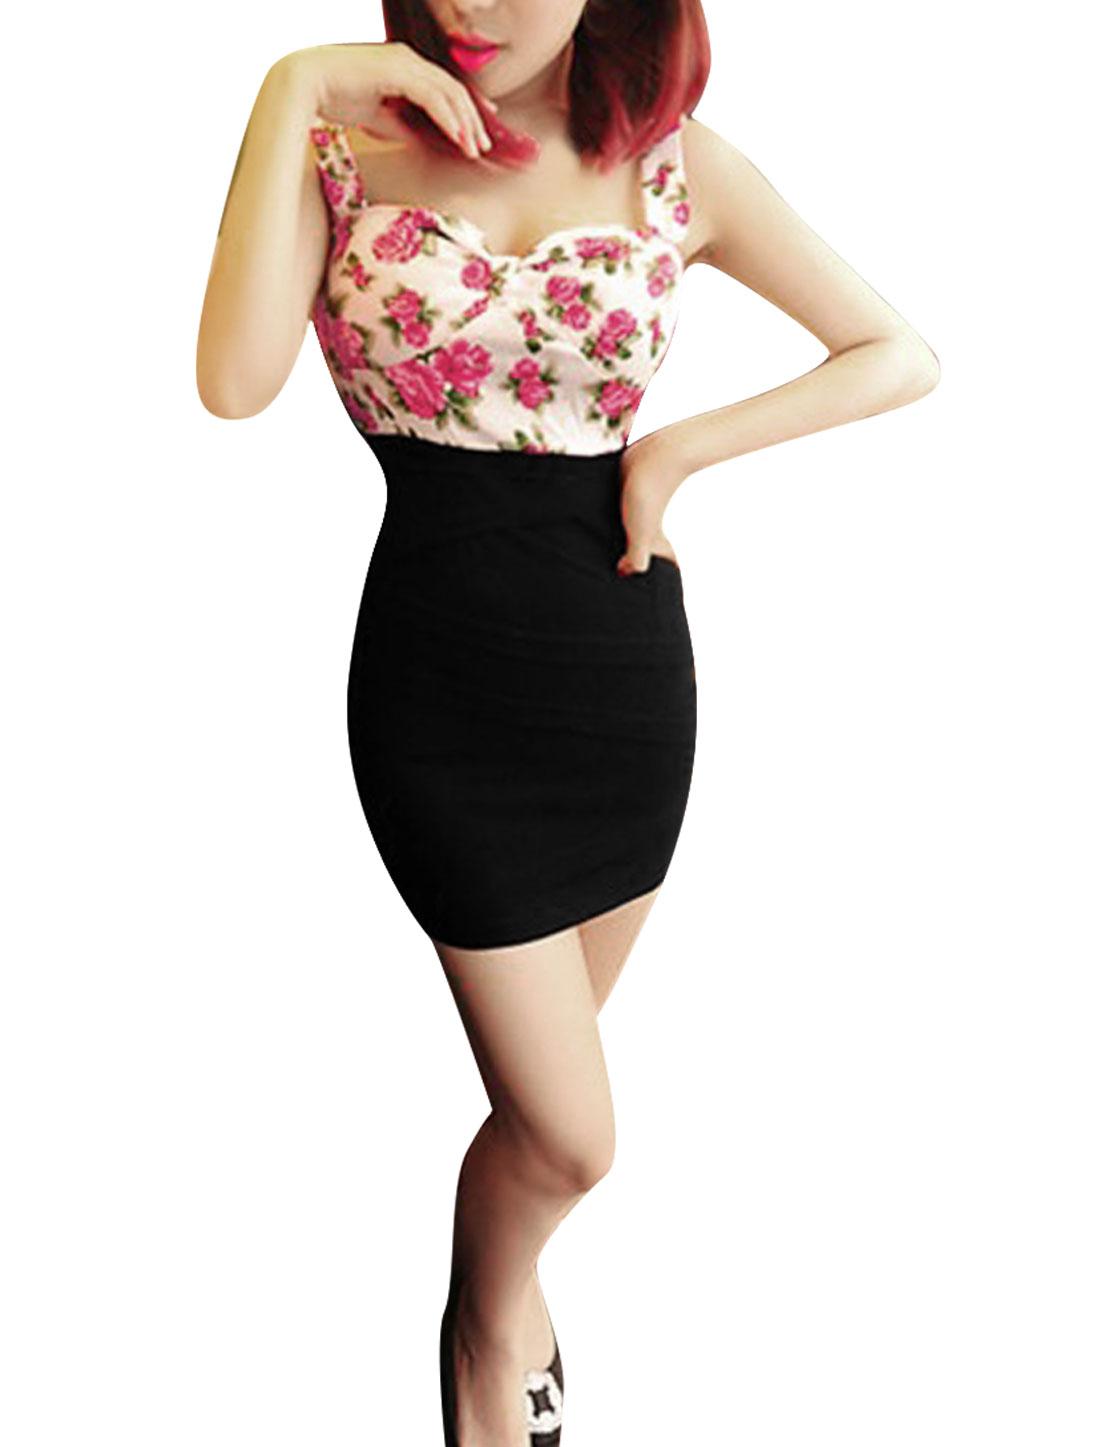 Women Sweetheart Neckline Backless Floral Sheath Dress White XS